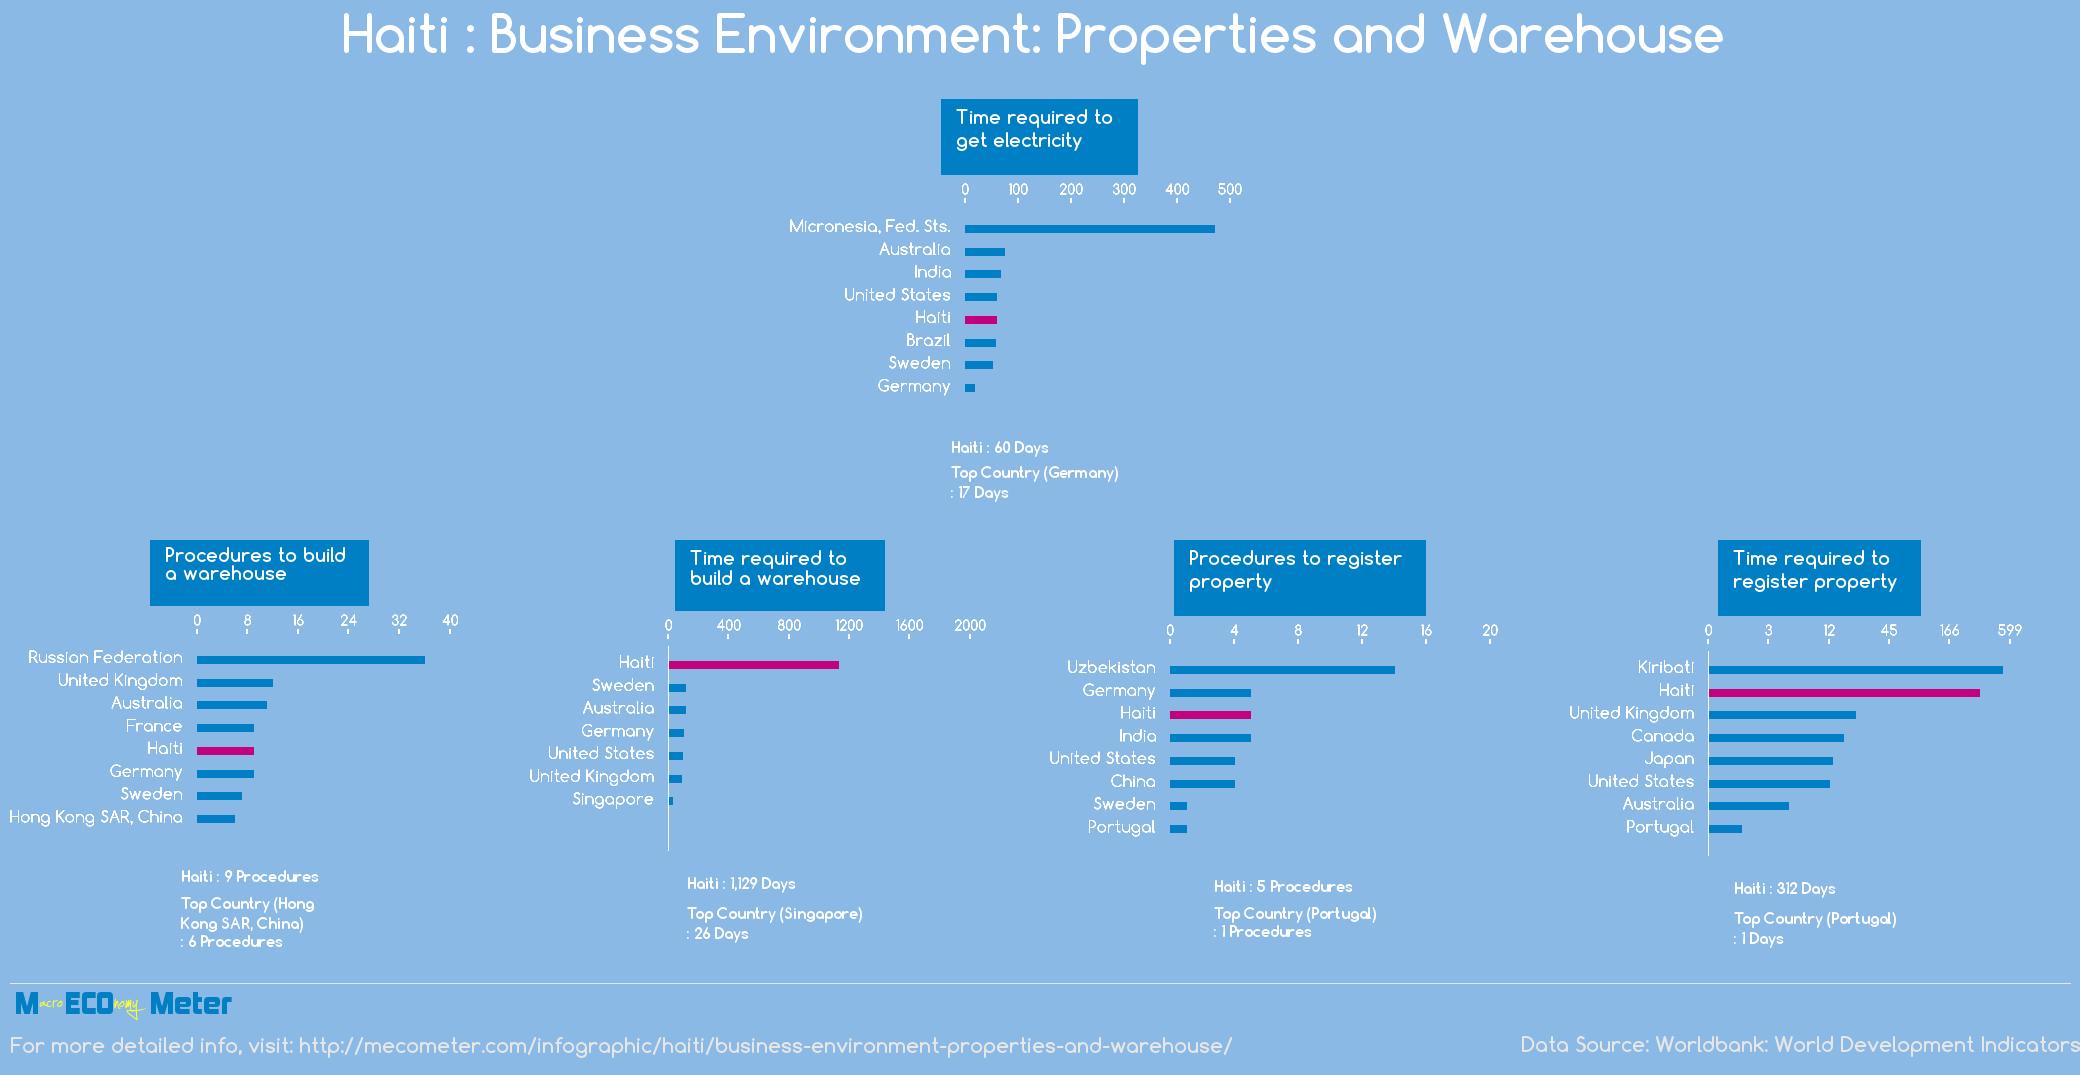 Haiti : Business Environment: Properties and Warehouse